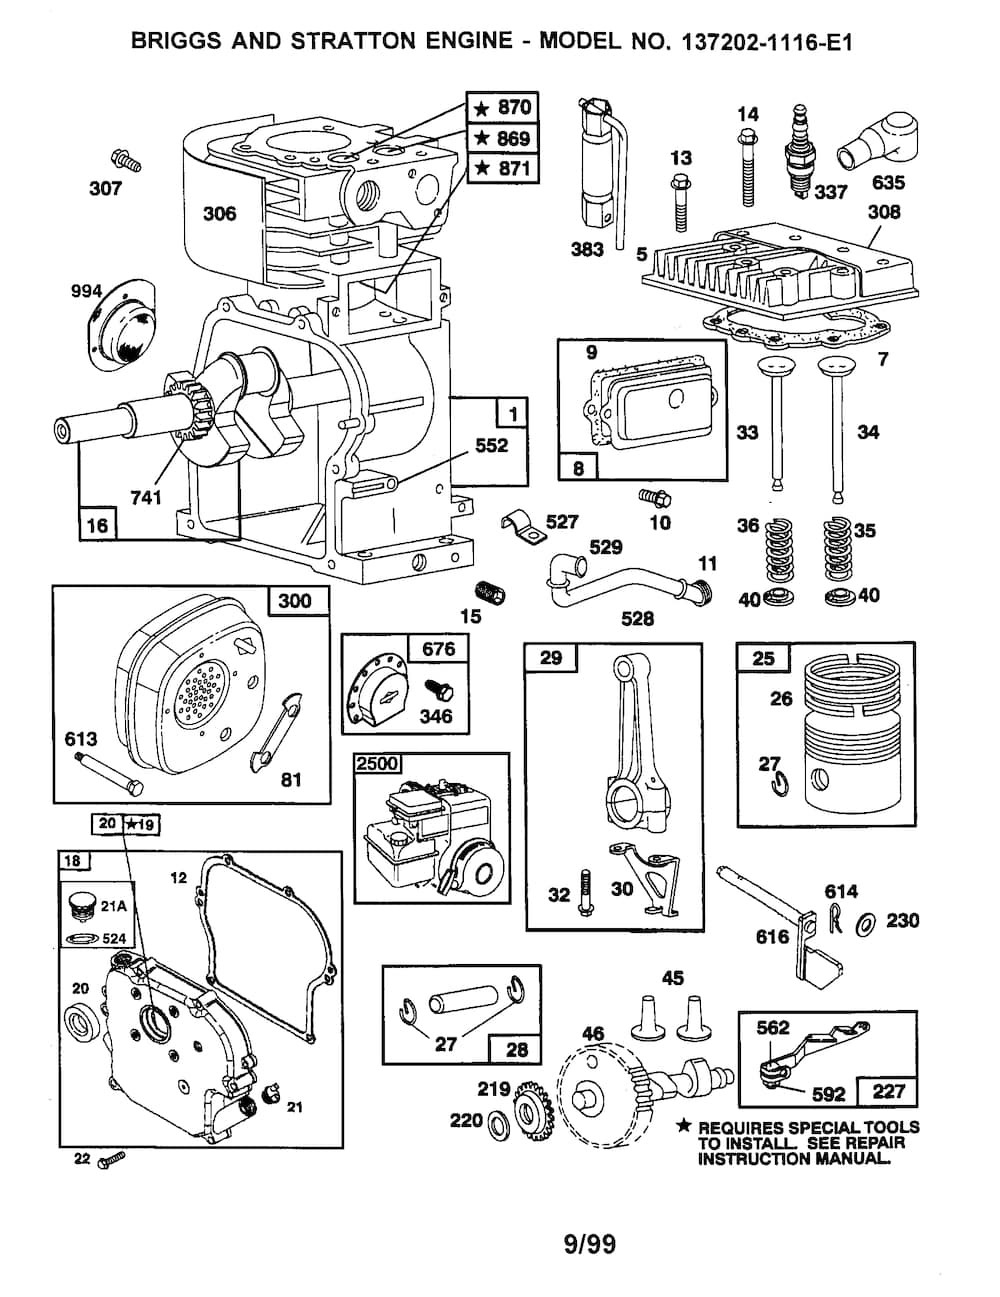 Briggs & Stratton Engine Parts and Diagrams Briggs and Stratton Engine Parts Diagram Of Briggs & Stratton Engine Parts and Diagrams